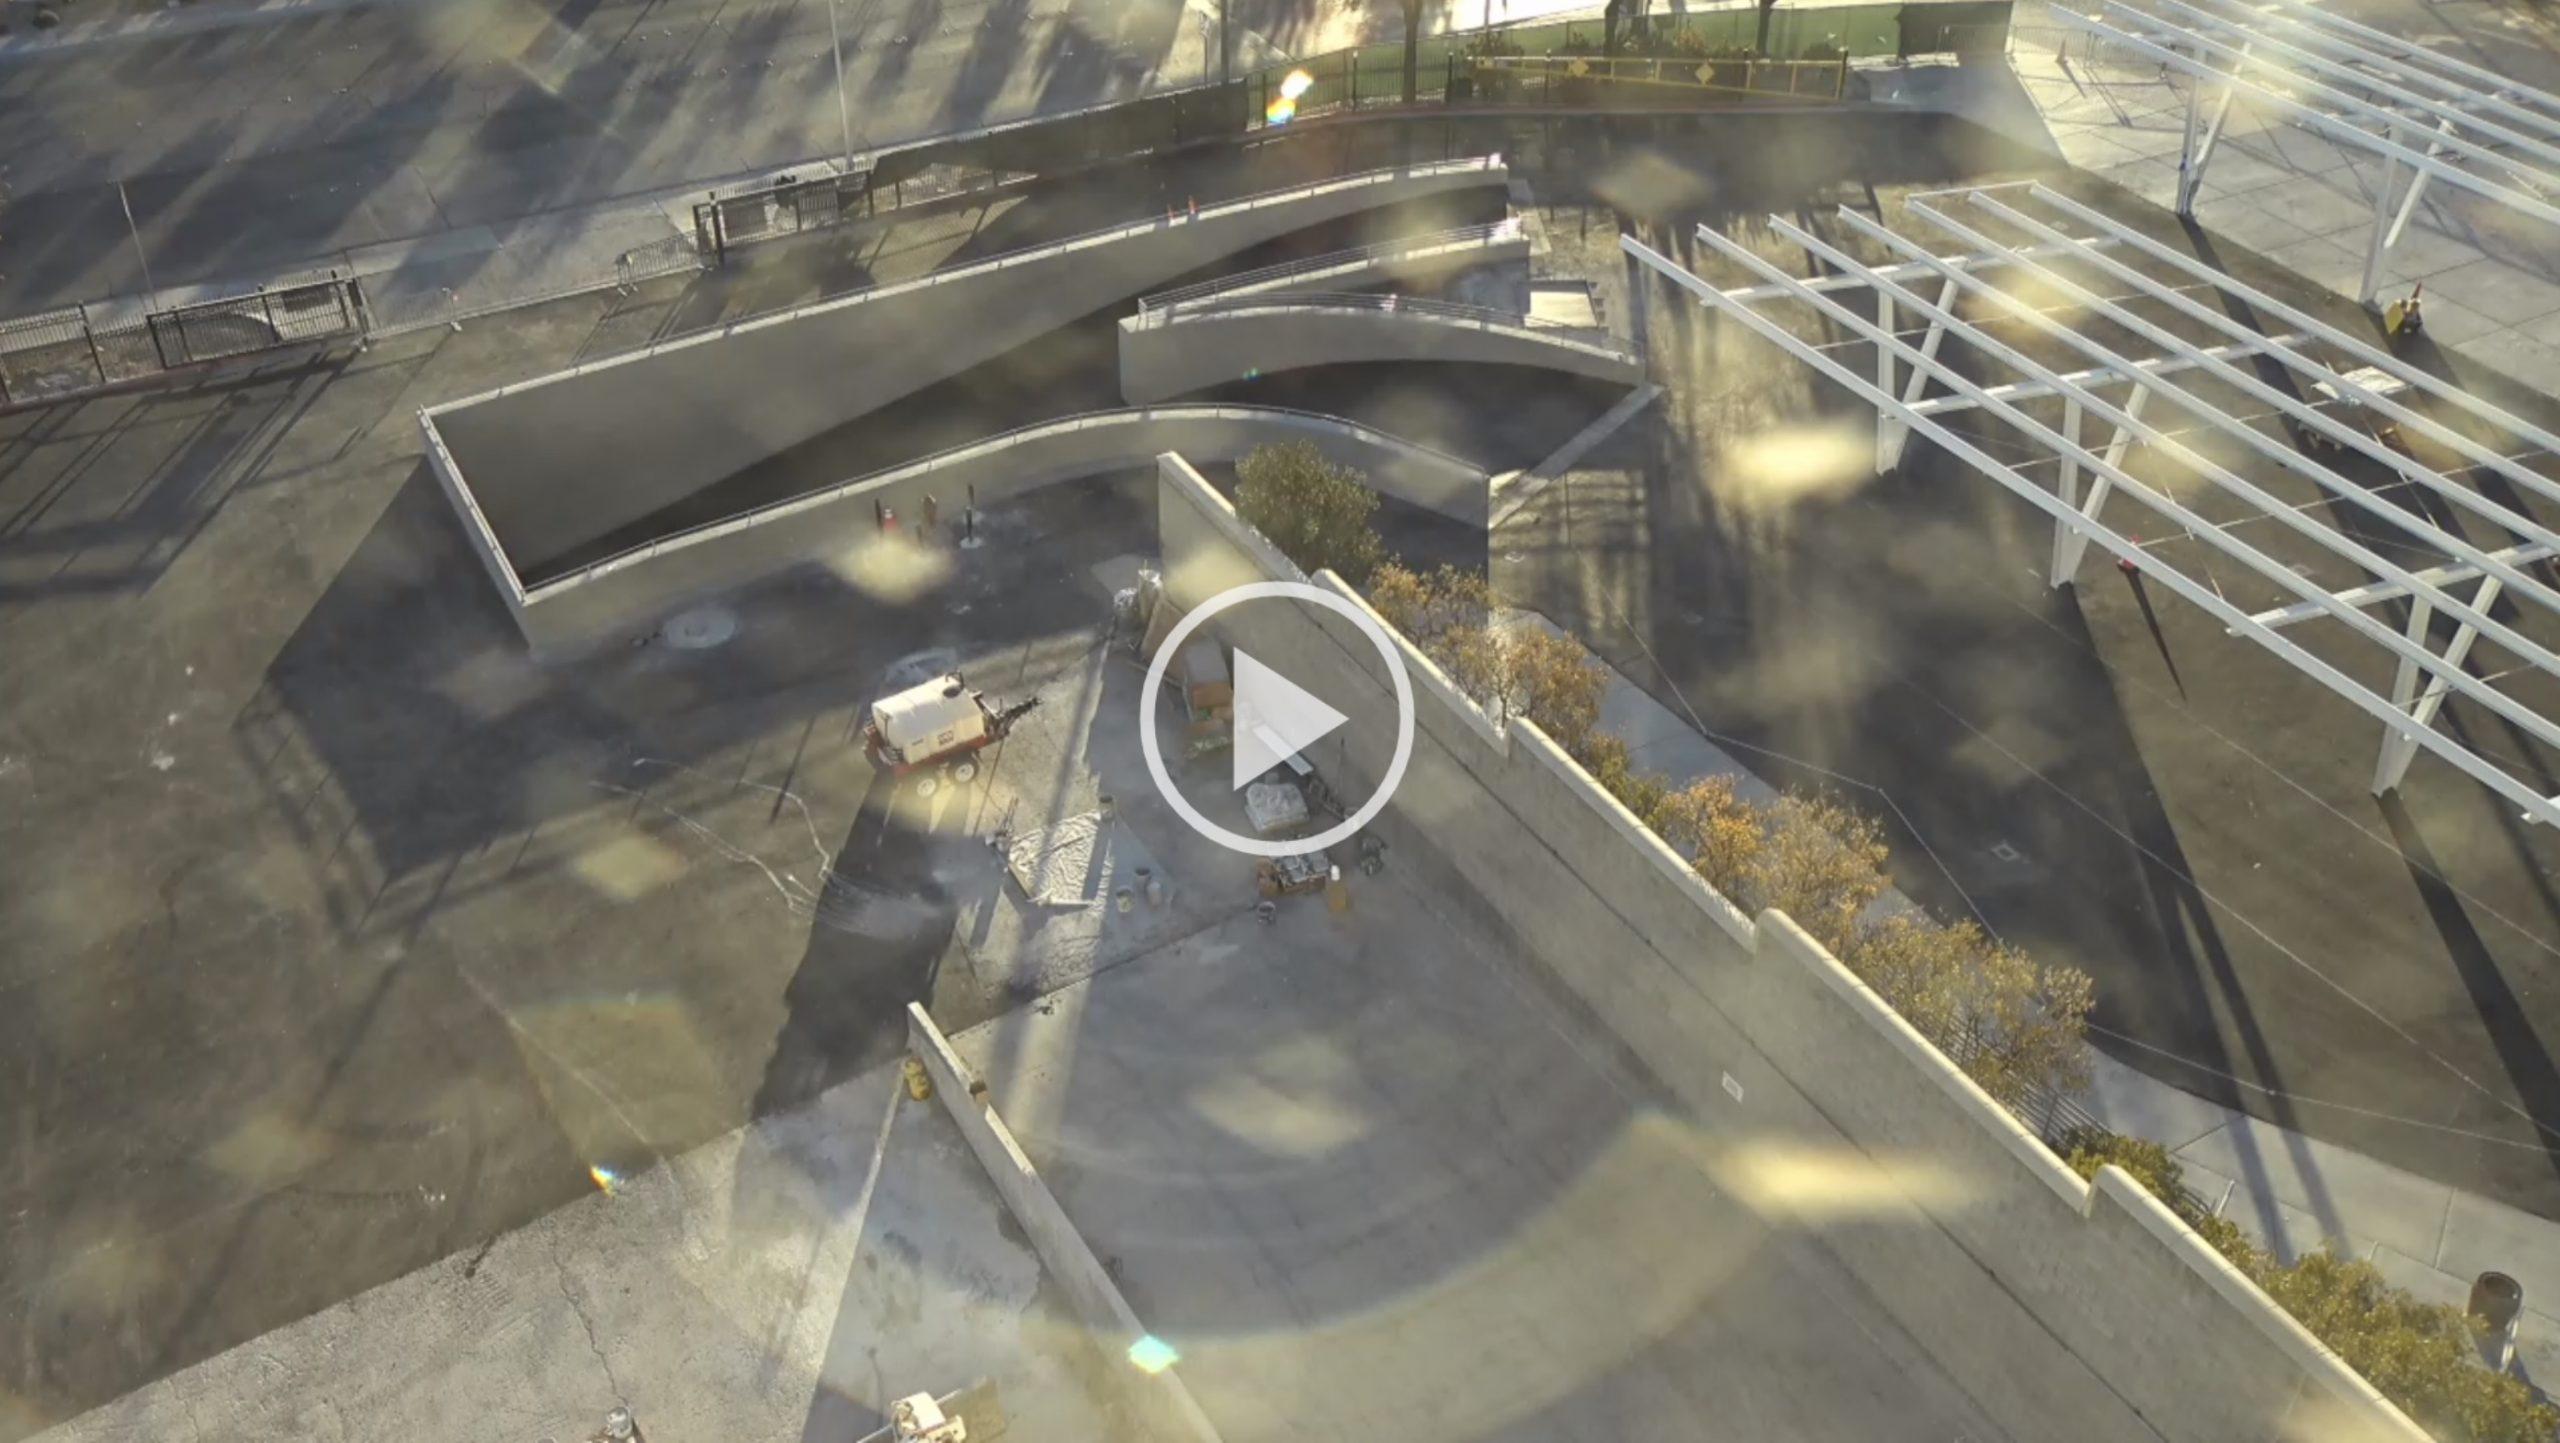 boring-company-tunnel-Las-Vegas-Loop-tesla-test-update-4